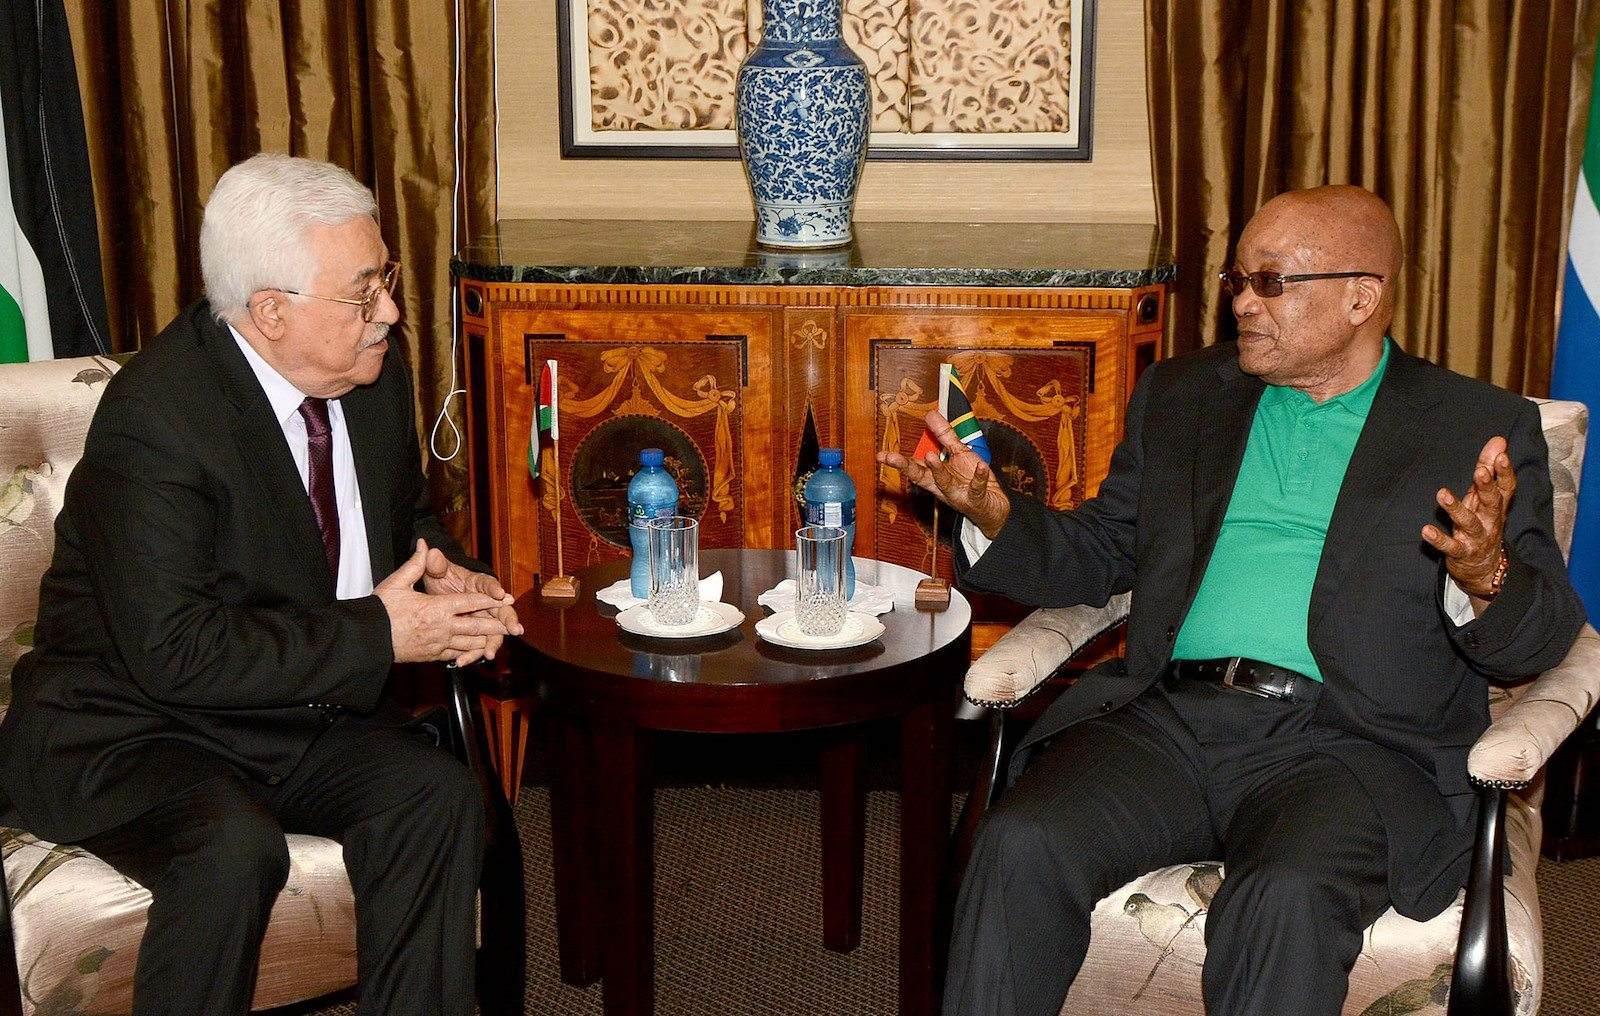 Sør-Afrikas president Jacob Zuma og palestinernes president Mahmoud Abbas. (Foto: GCIS)